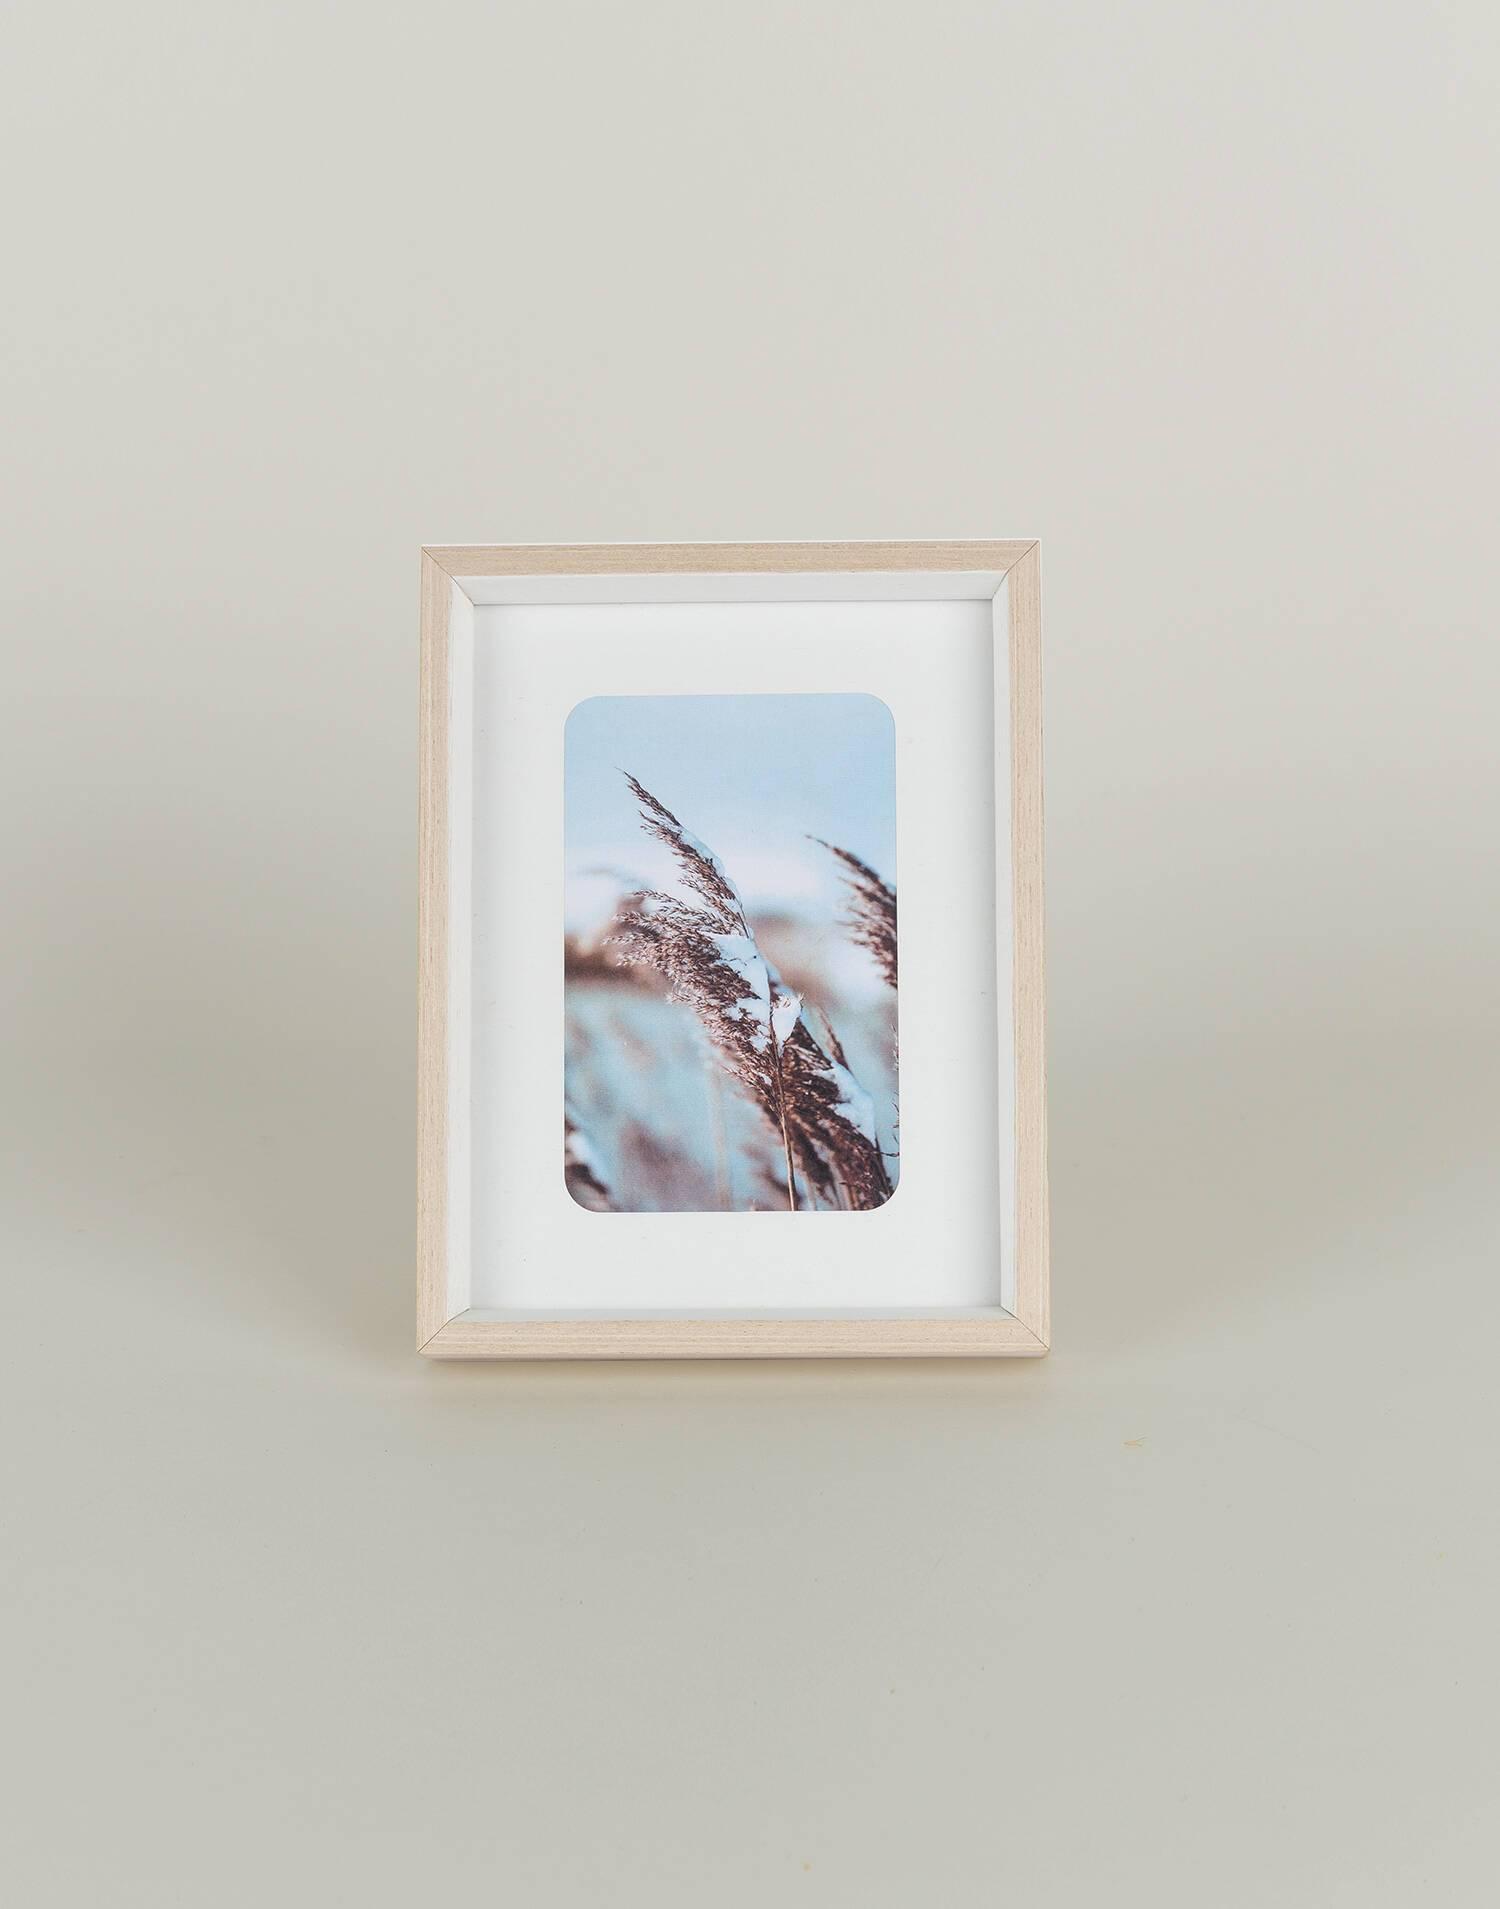 Basic wood frame